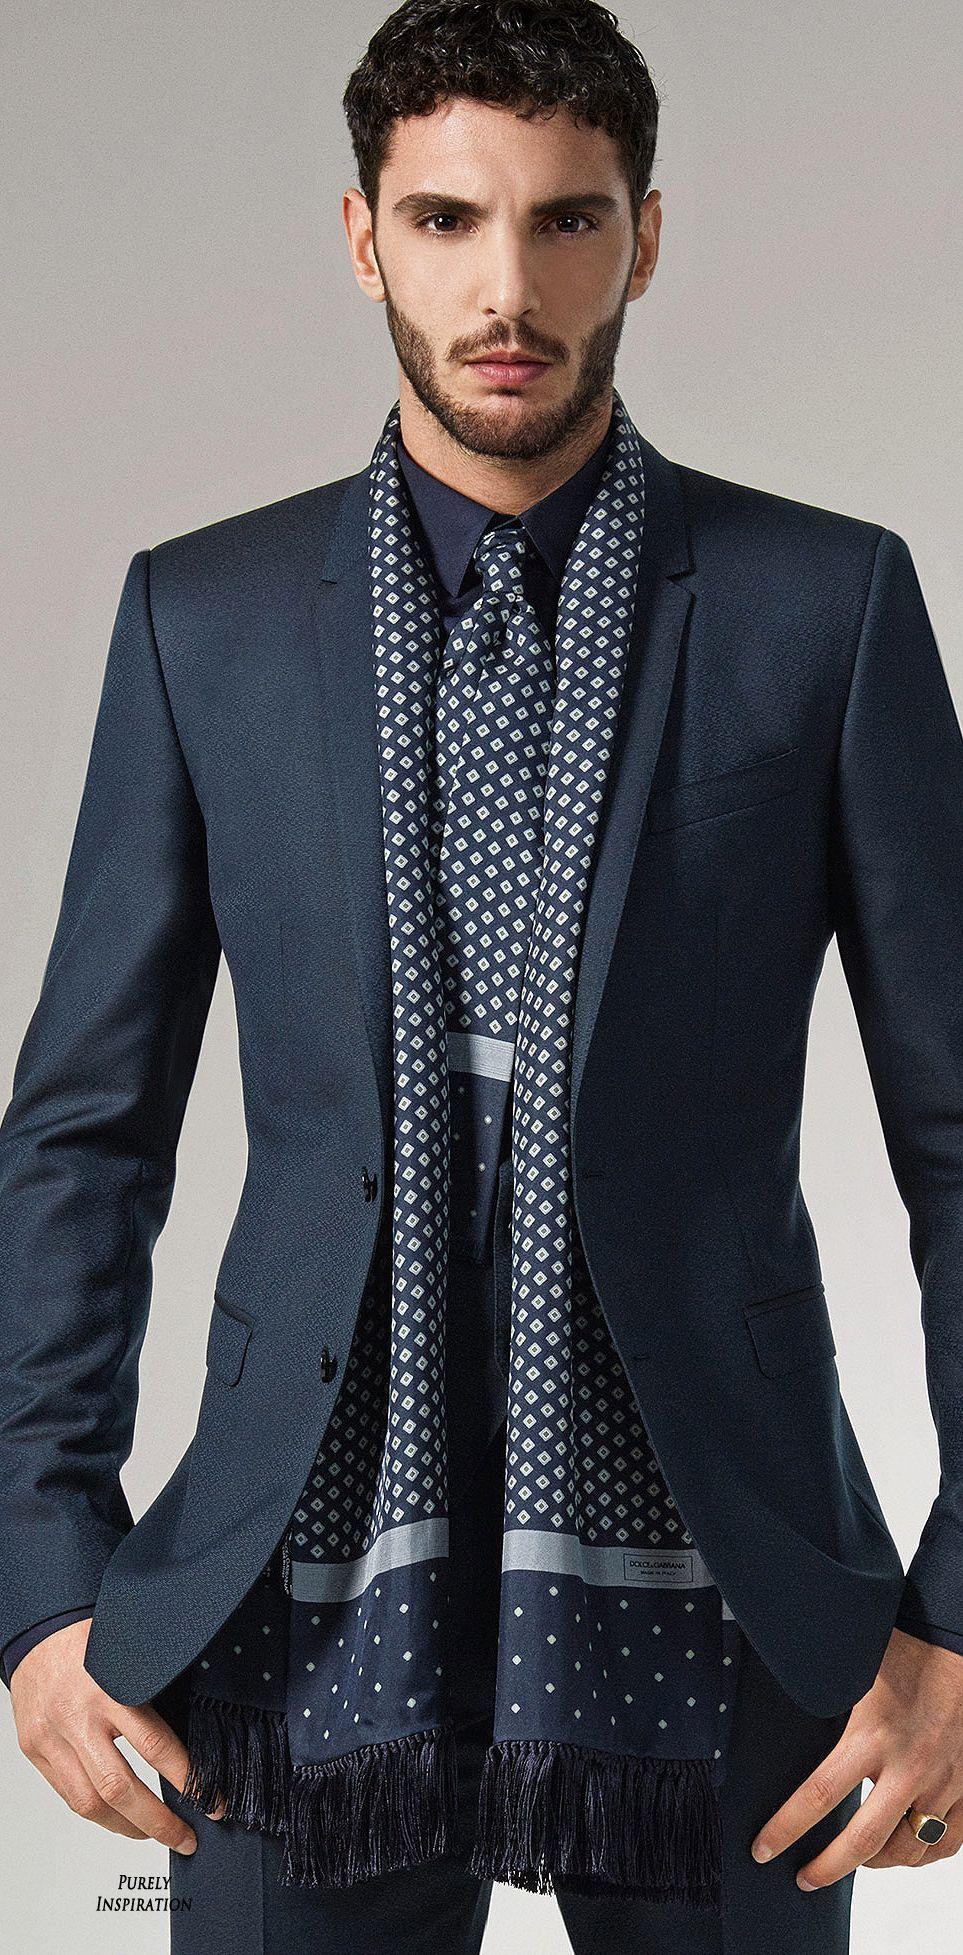 Dolce u Gabbana FW Menswear Collection Purely Inspiration